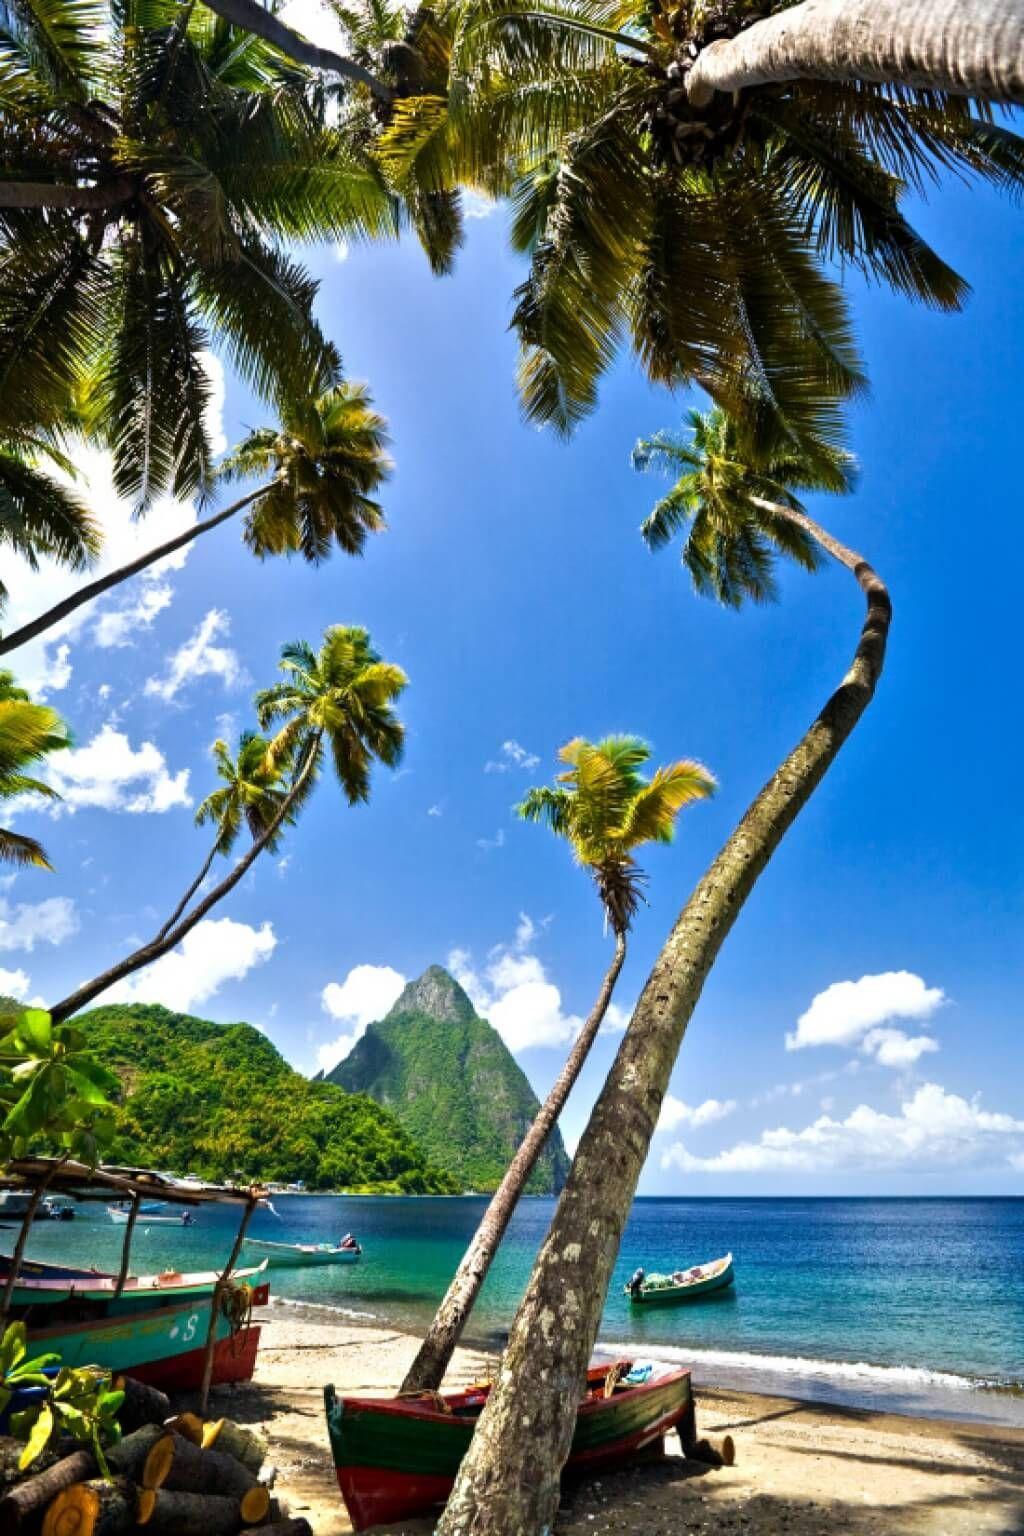 Beach on island of St Lucia in the Caribbean #stlucia #caribbean #sea #ocean #islands #island #holid...